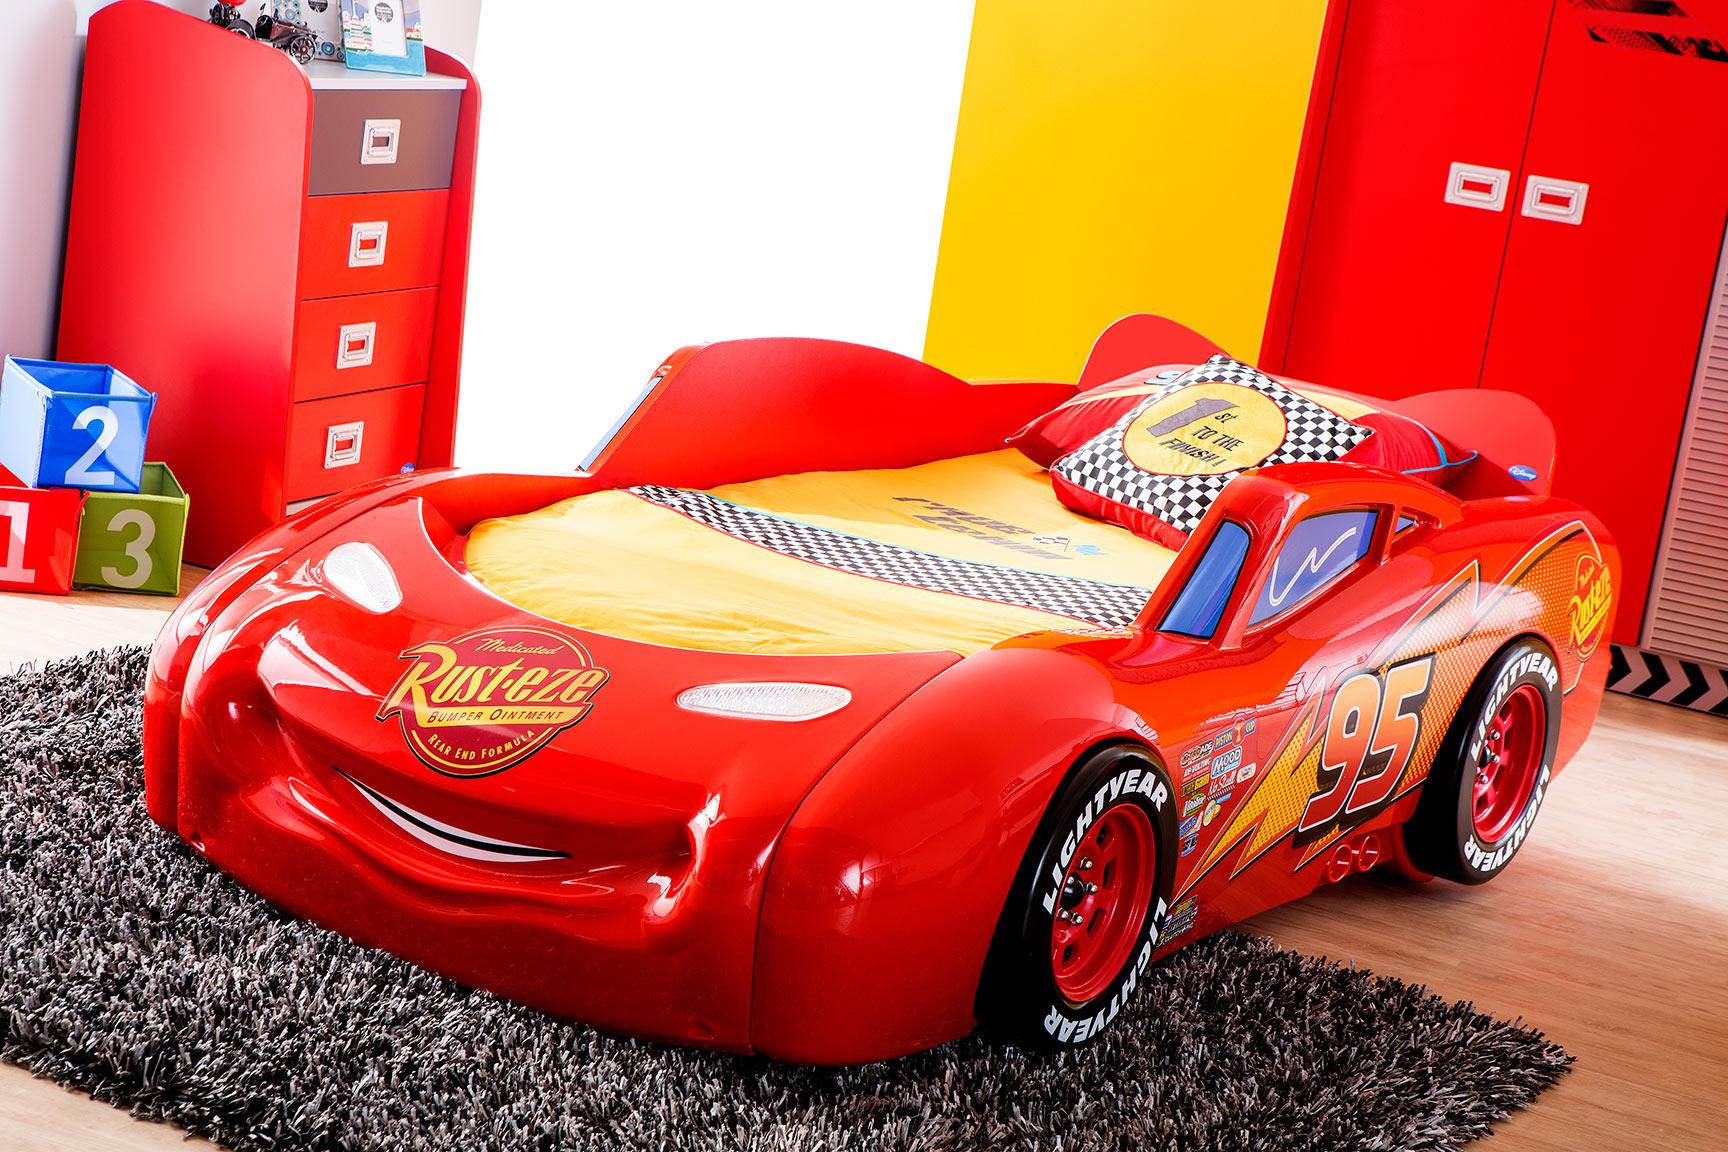 Full Size of Cars Bett Kinderzimmer Piston Cup Betten Münster 180x200 Such Frau Fürs Schlafzimmer Set Mit Boxspringbett Stauraum 160x200 Einfaches Rausfallschutz Bett Cars Bett